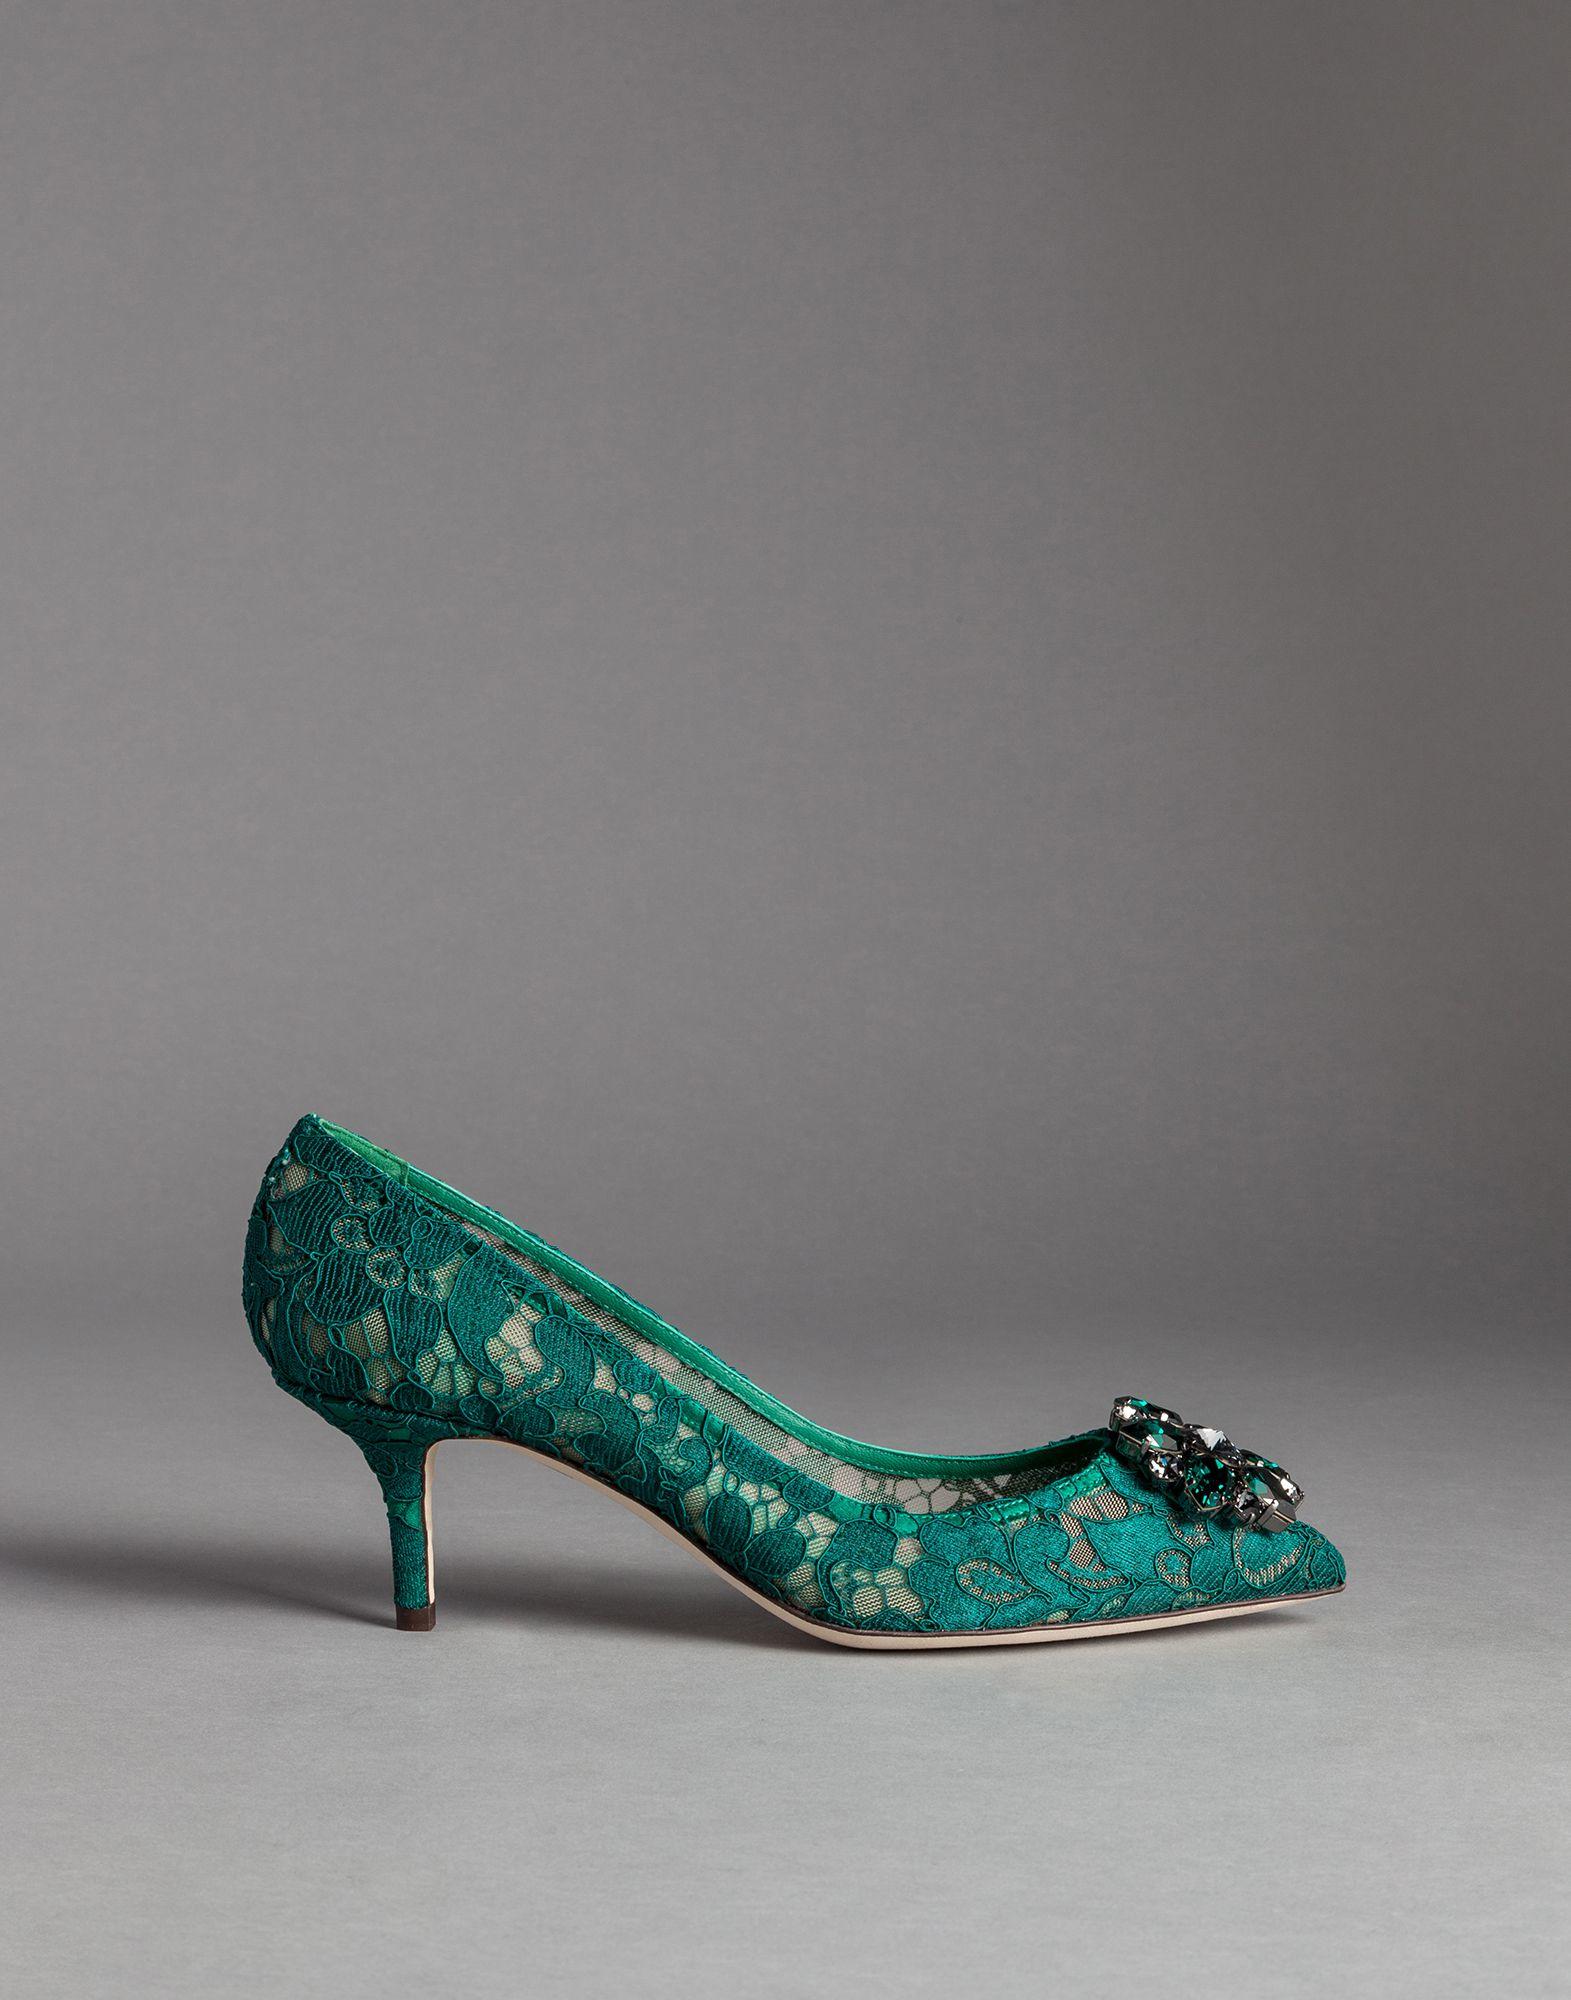 Dolce And Gabbana Green Heels | The Art